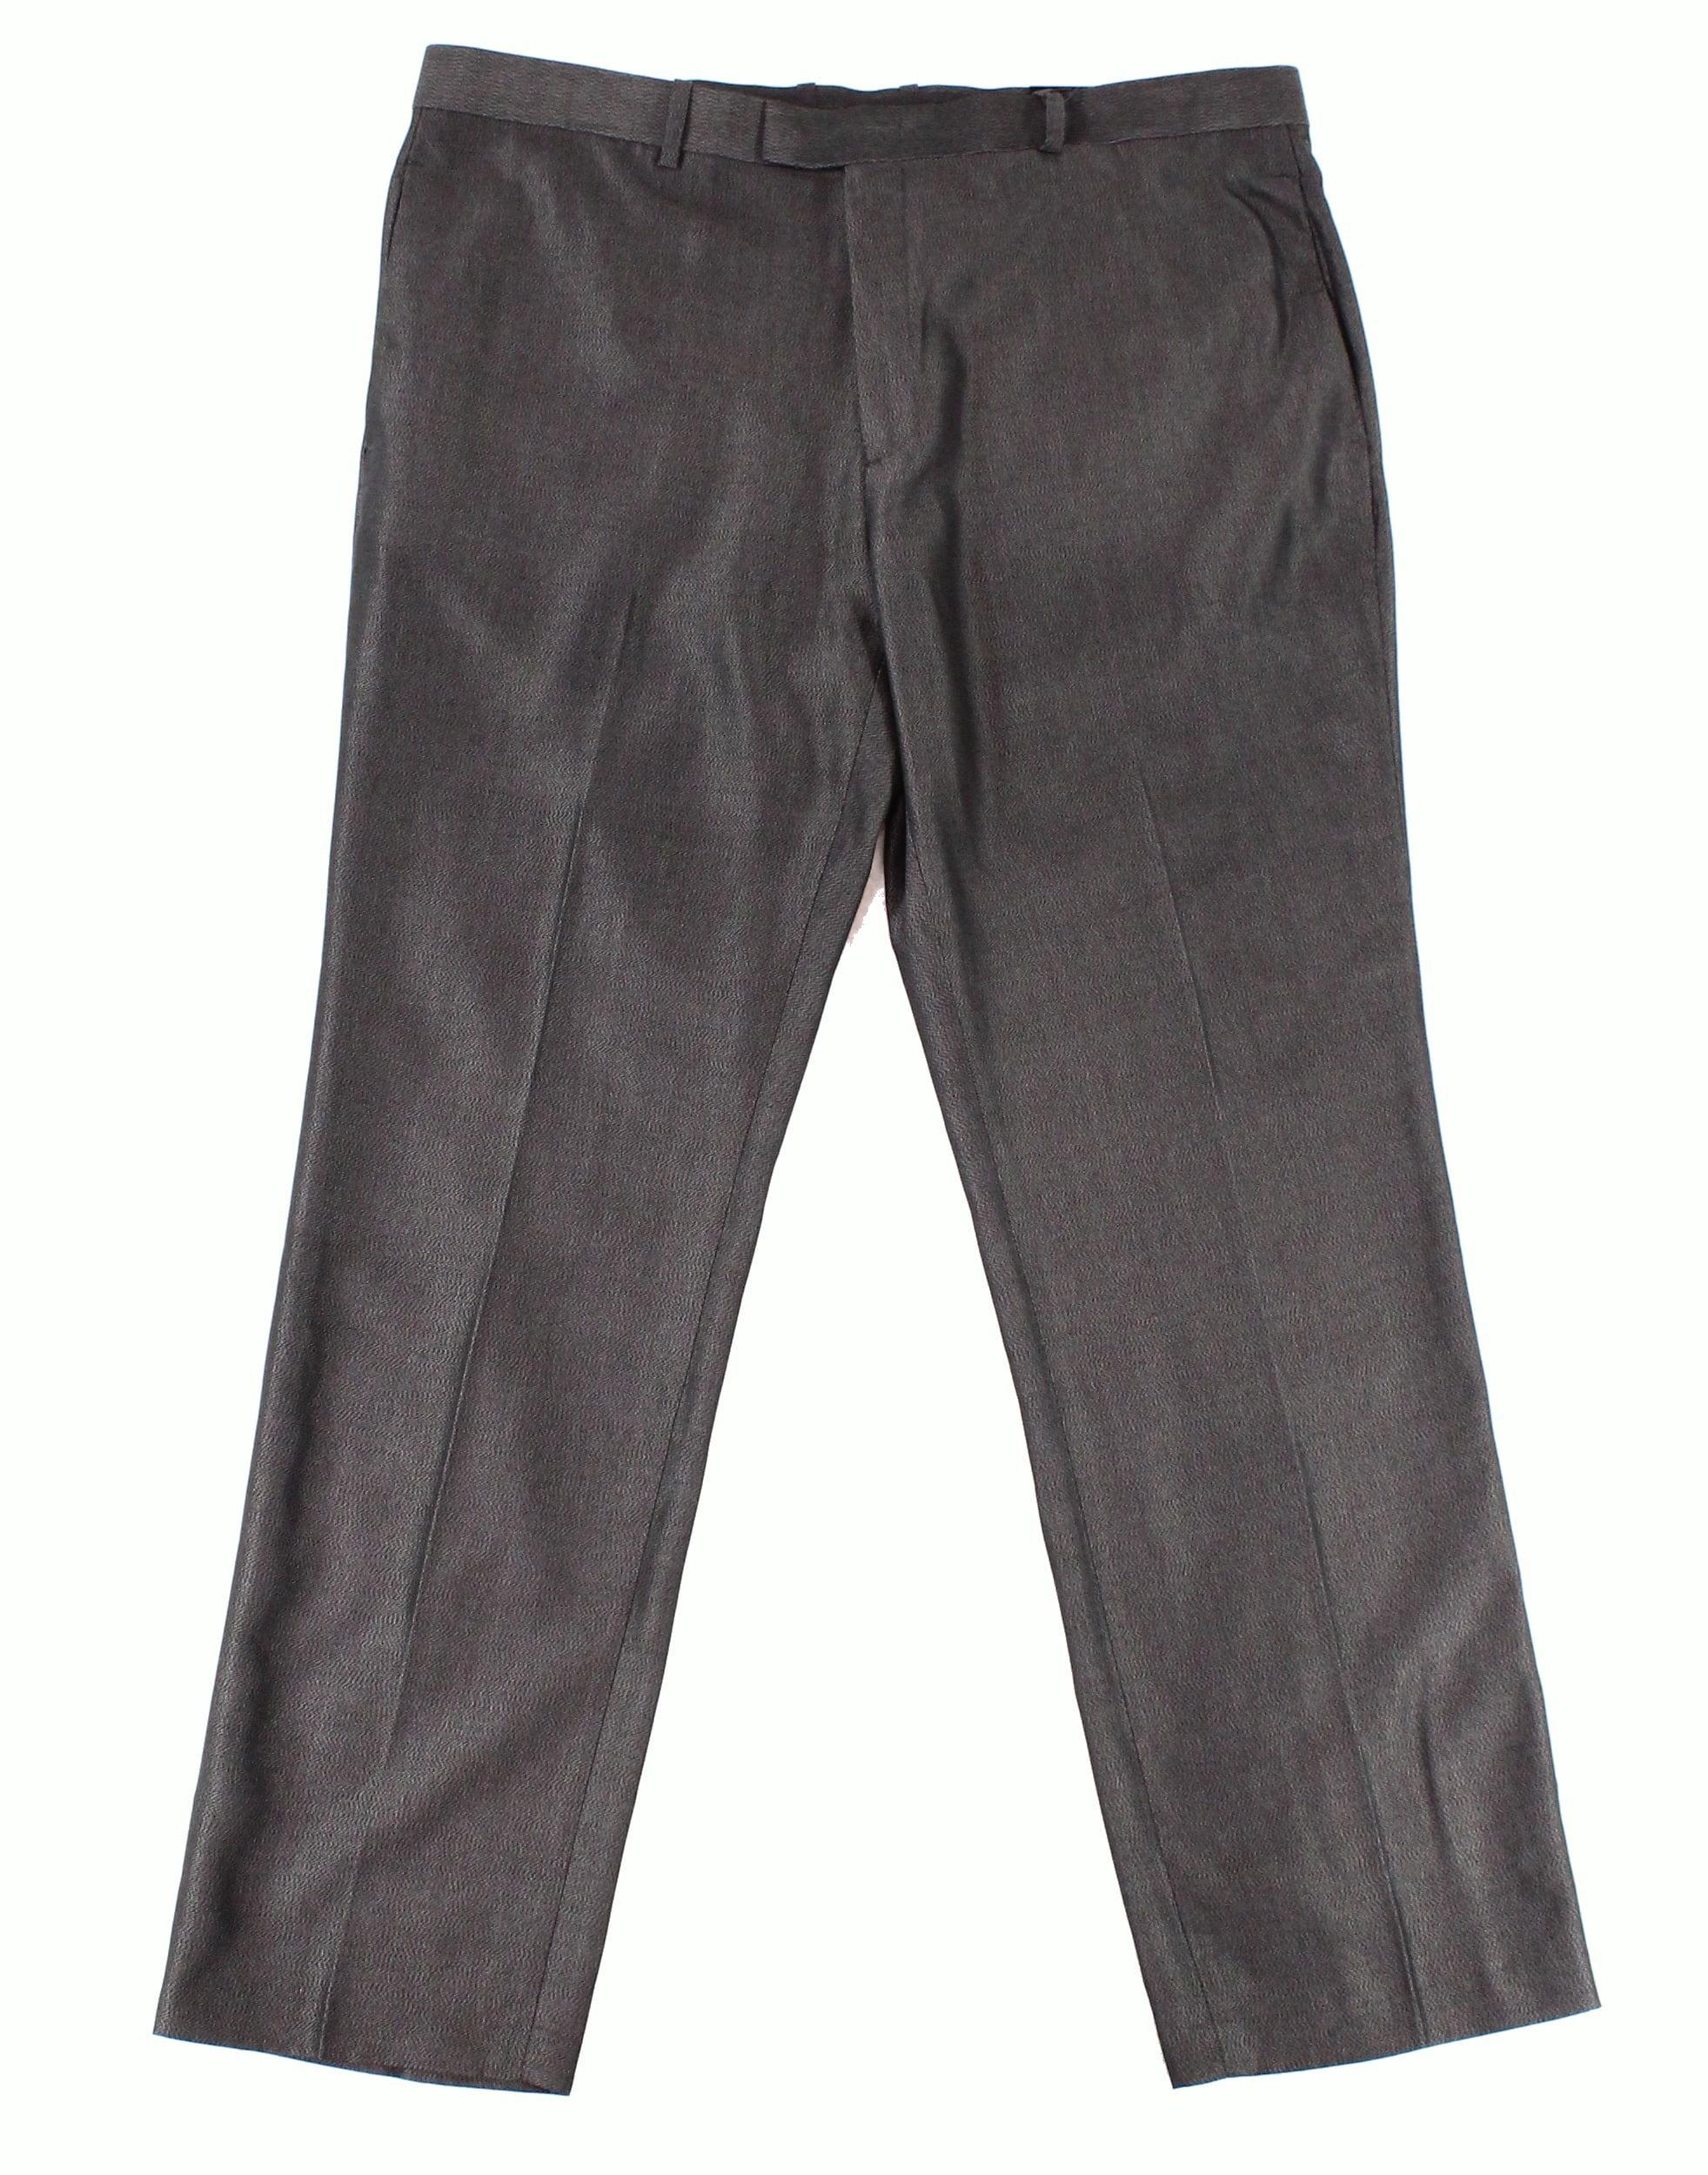 Alfani NEW Charcoal Gray Mens Size 38x30 Printed Dress Flat Front Pants